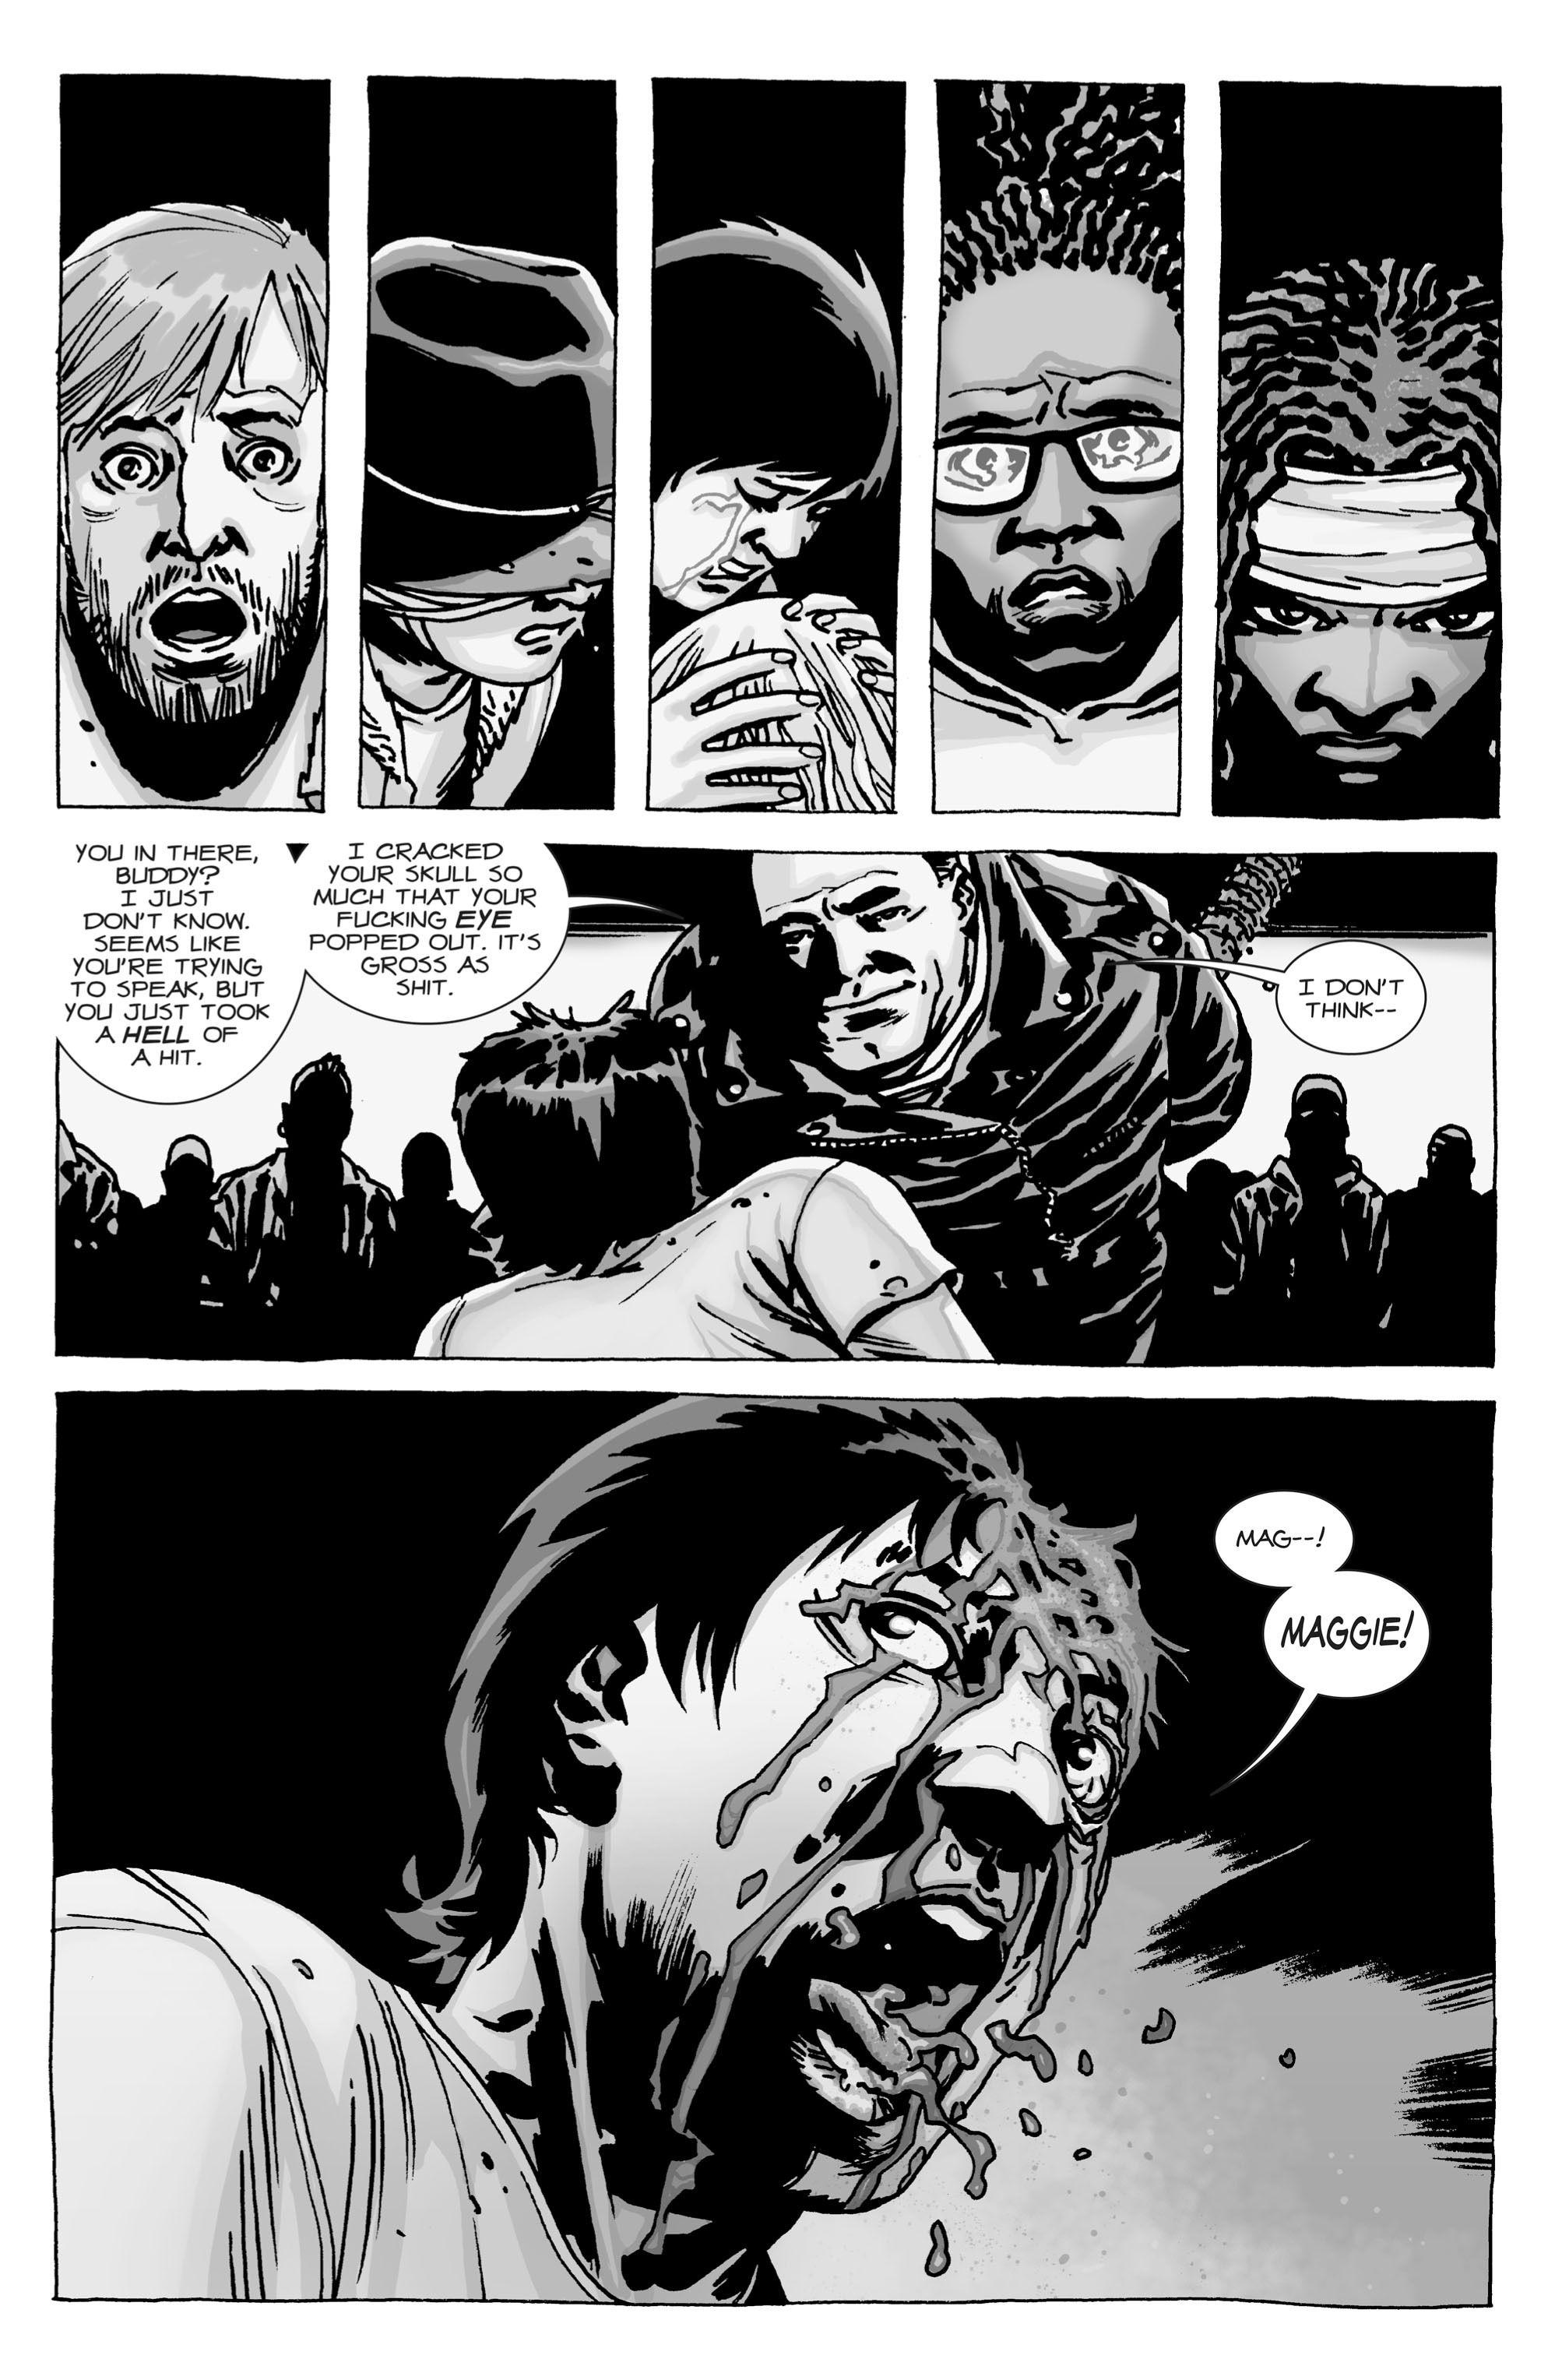 The Walking Dead Issue #100 - Read The Walking Dead Issue #100 comic ...